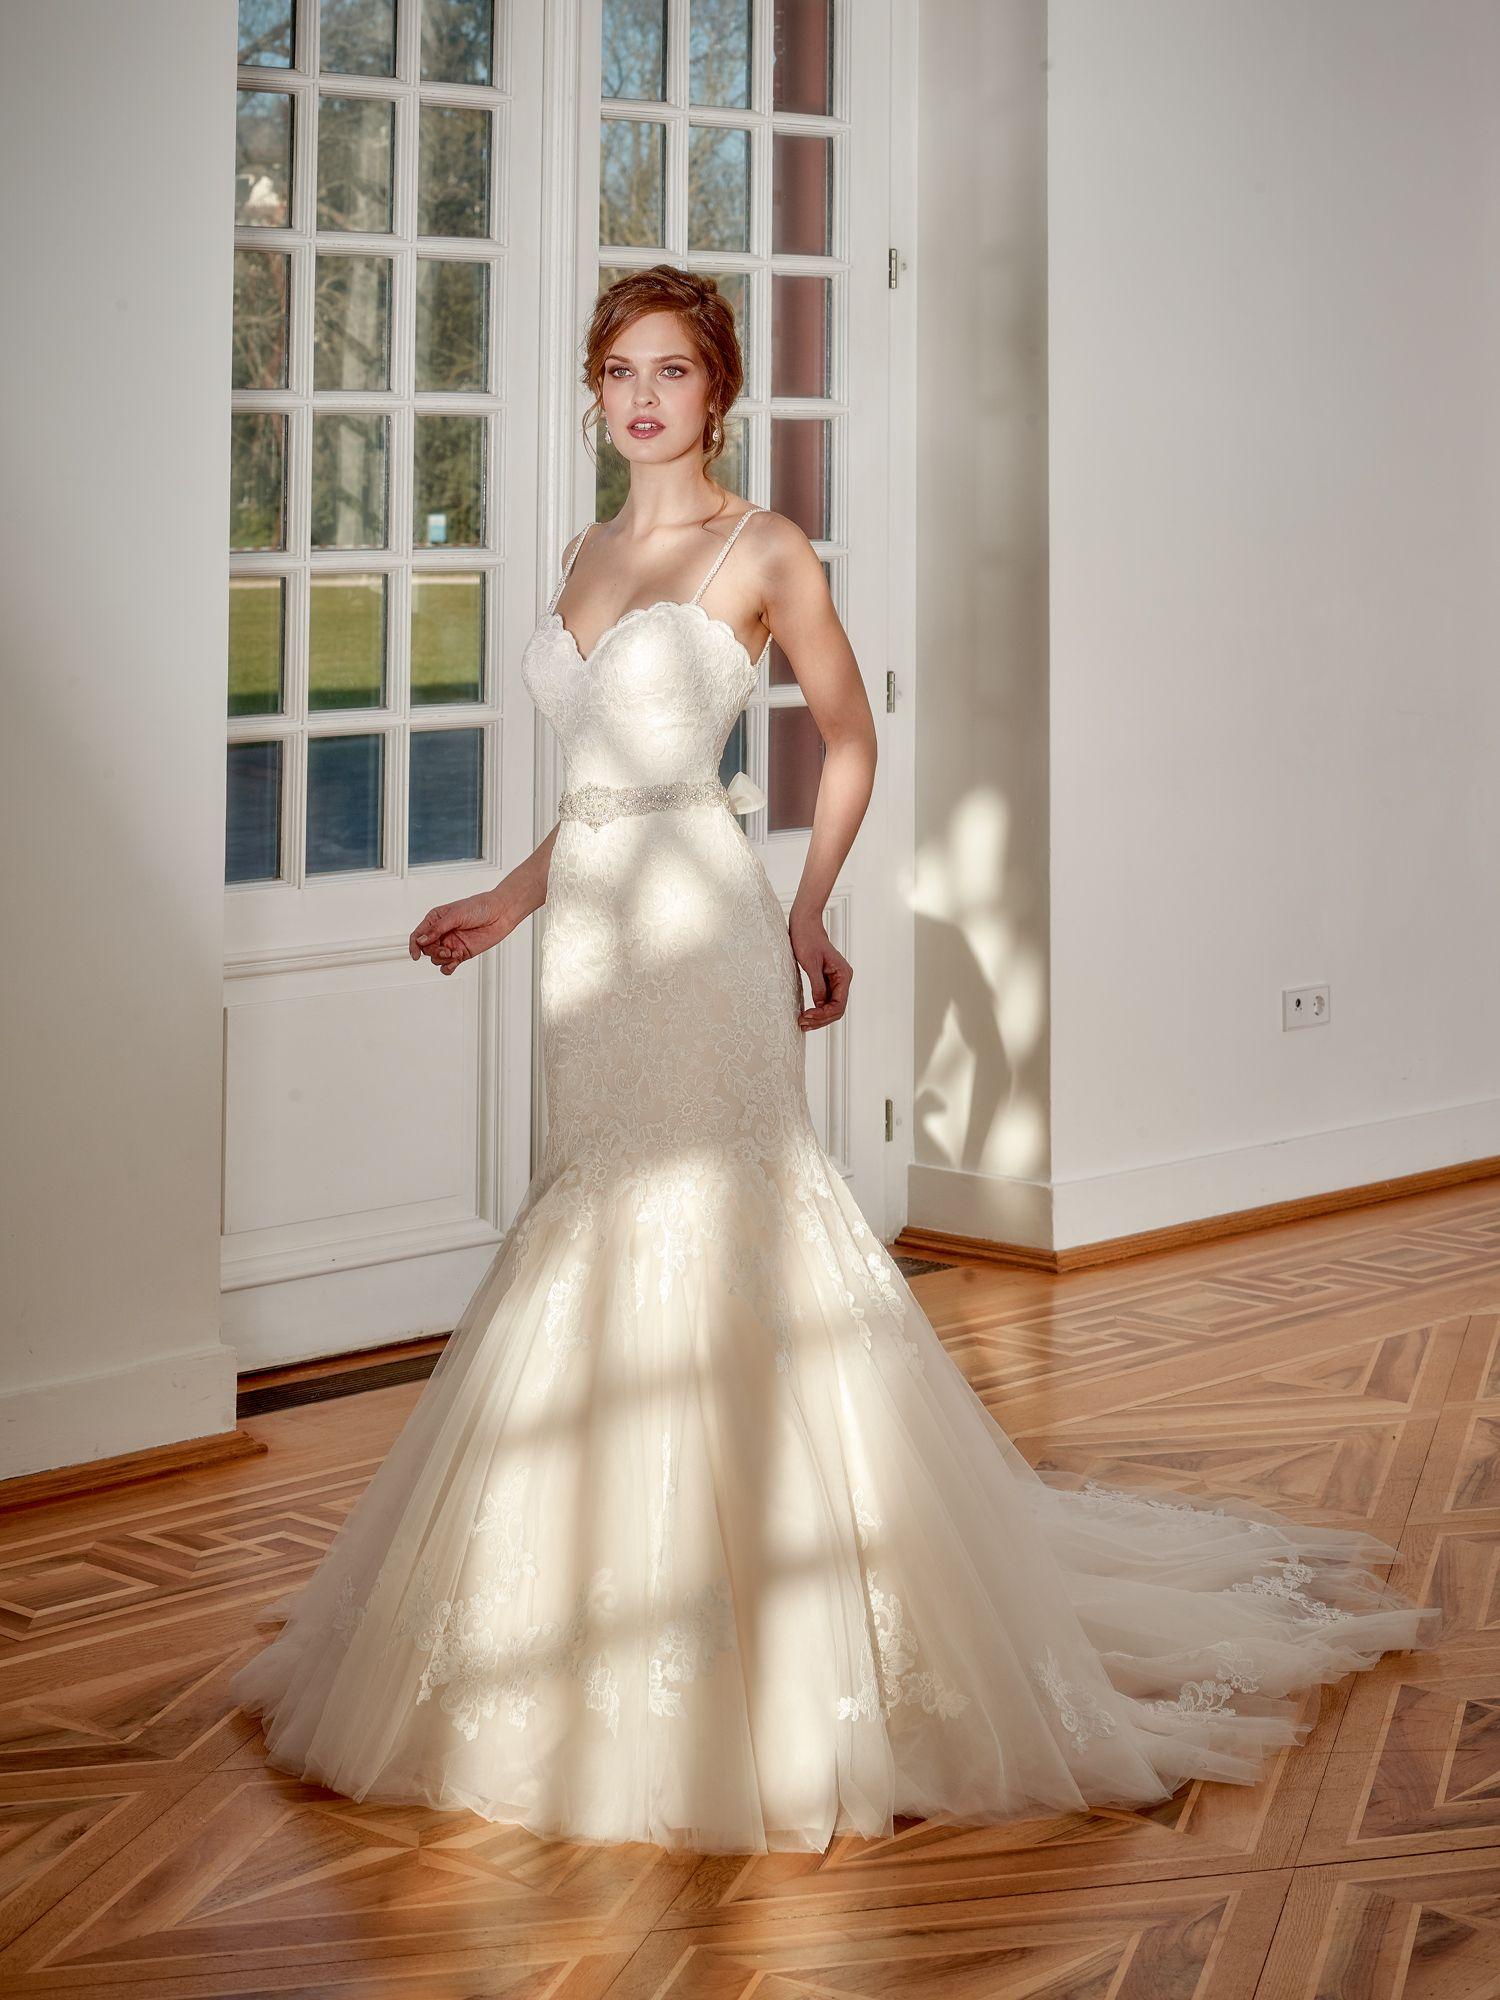 Wedding Dresses Stratford Diane Legrand 6229 Agbridal.co